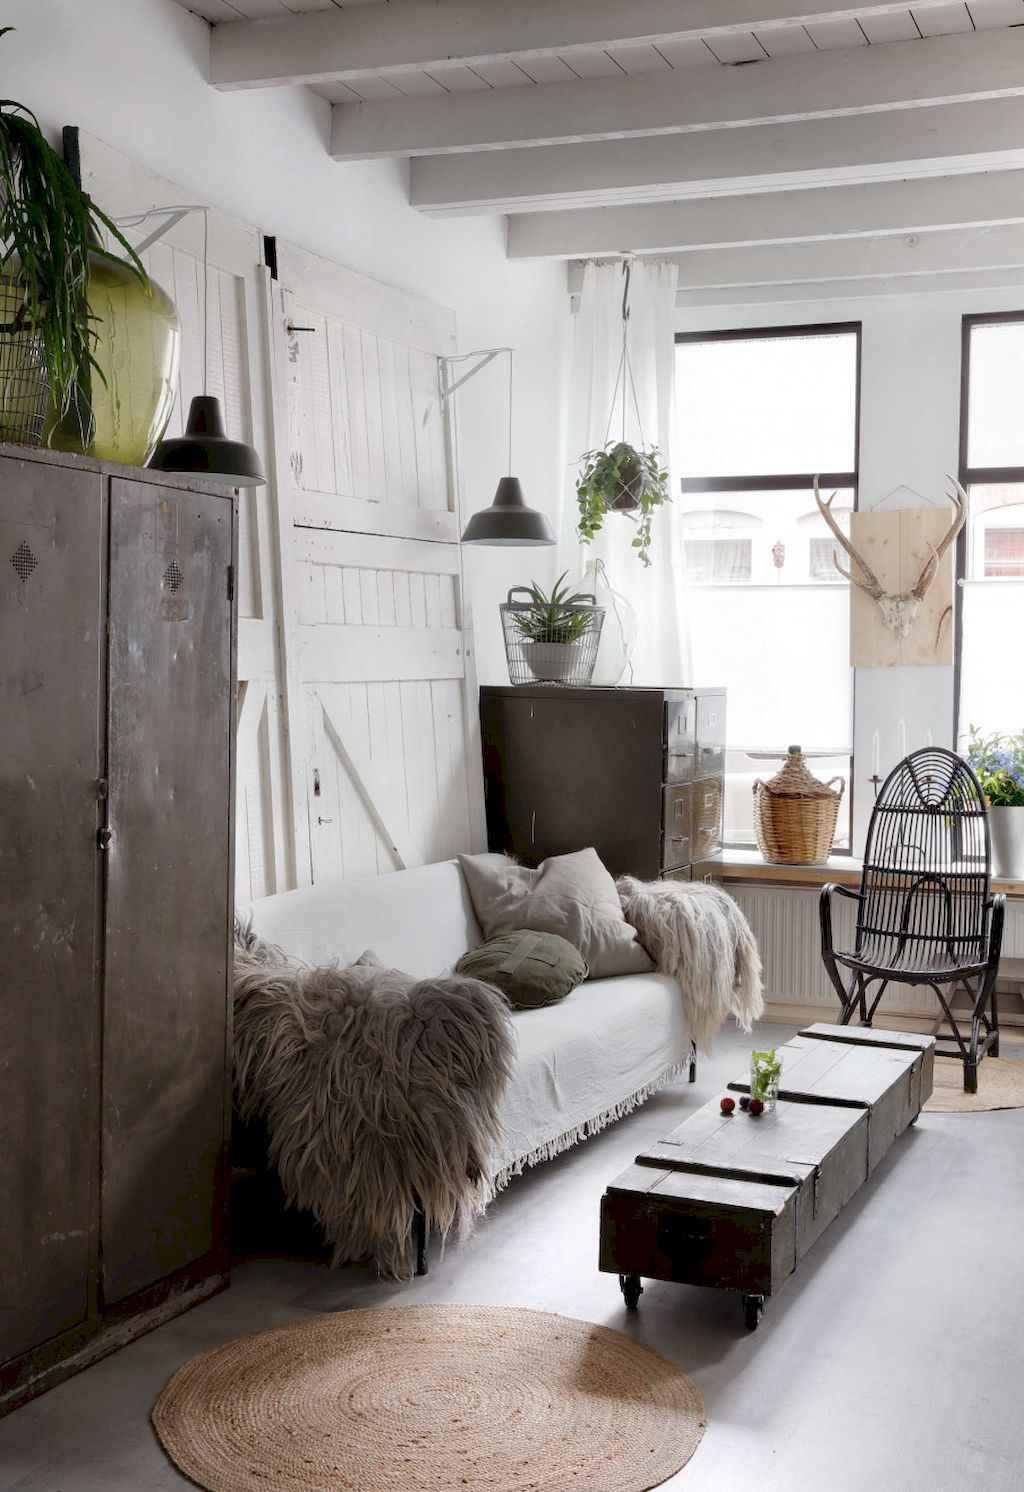 Simple clean vintage living room decorating ideas (35)